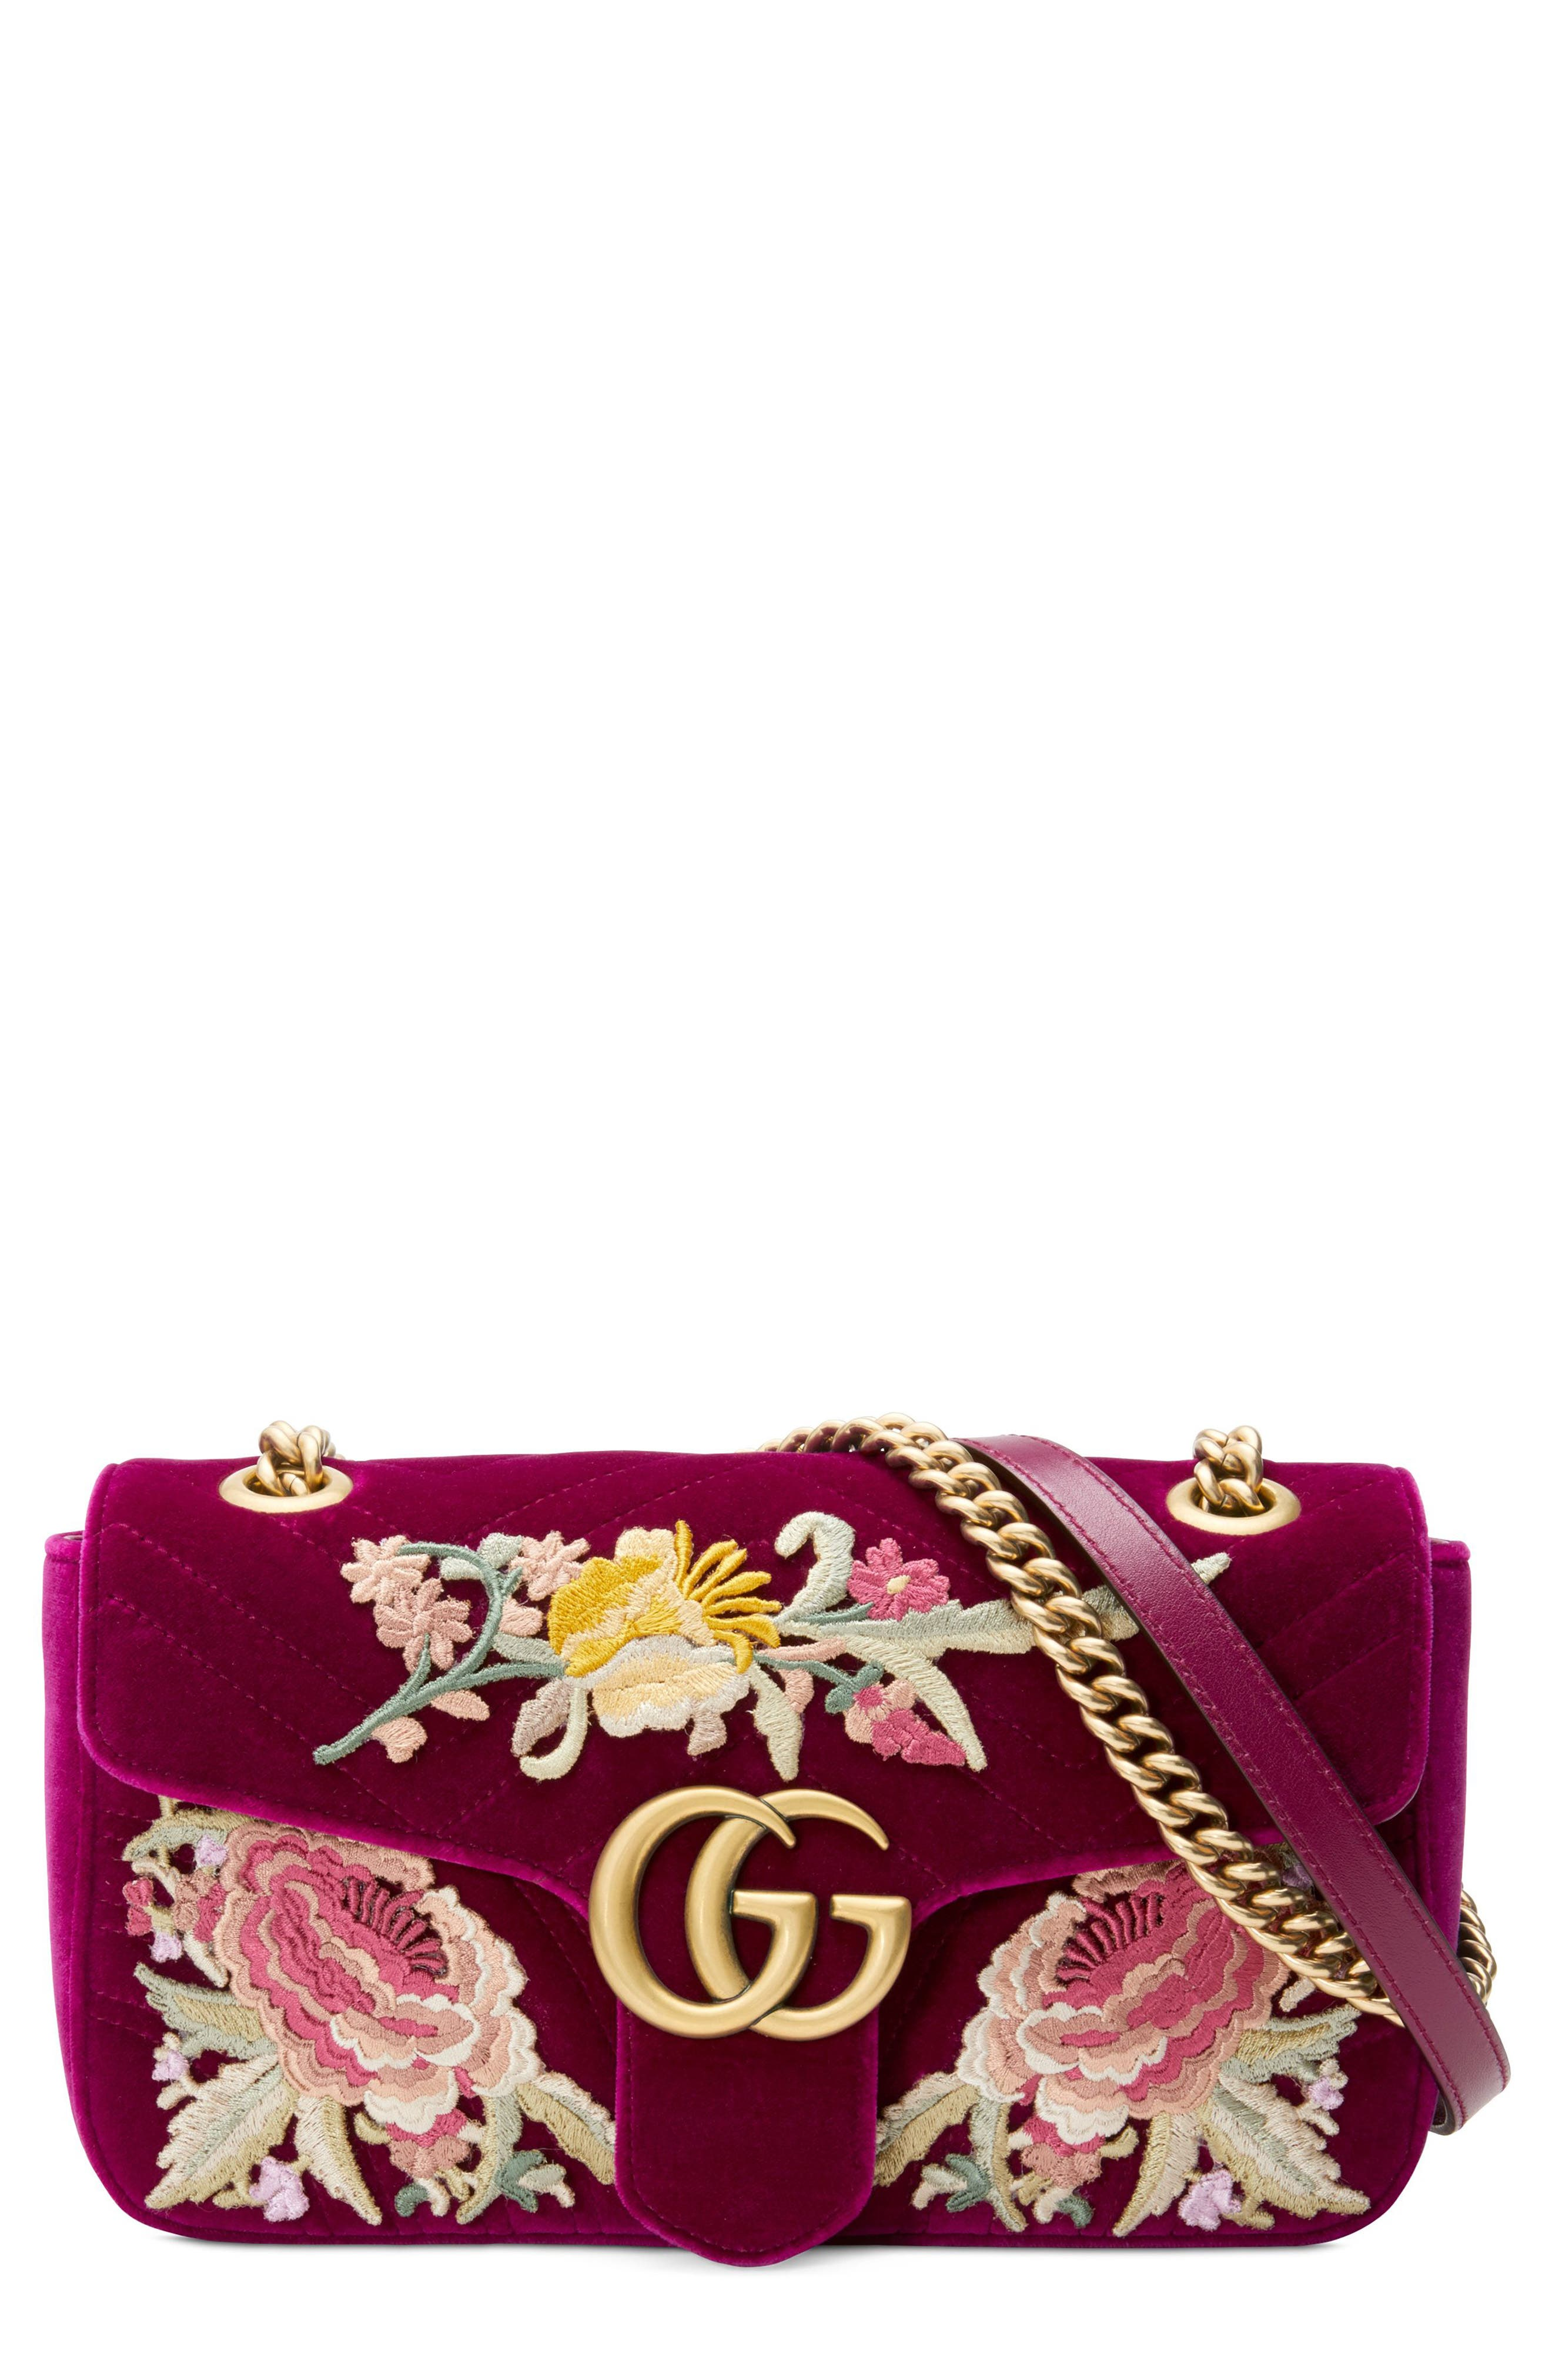 Small GG Marmont 2.0 Matelassé Velvet Shoulder Bag,                         Main,                         color, FUCHSIA/ FUCHSIA